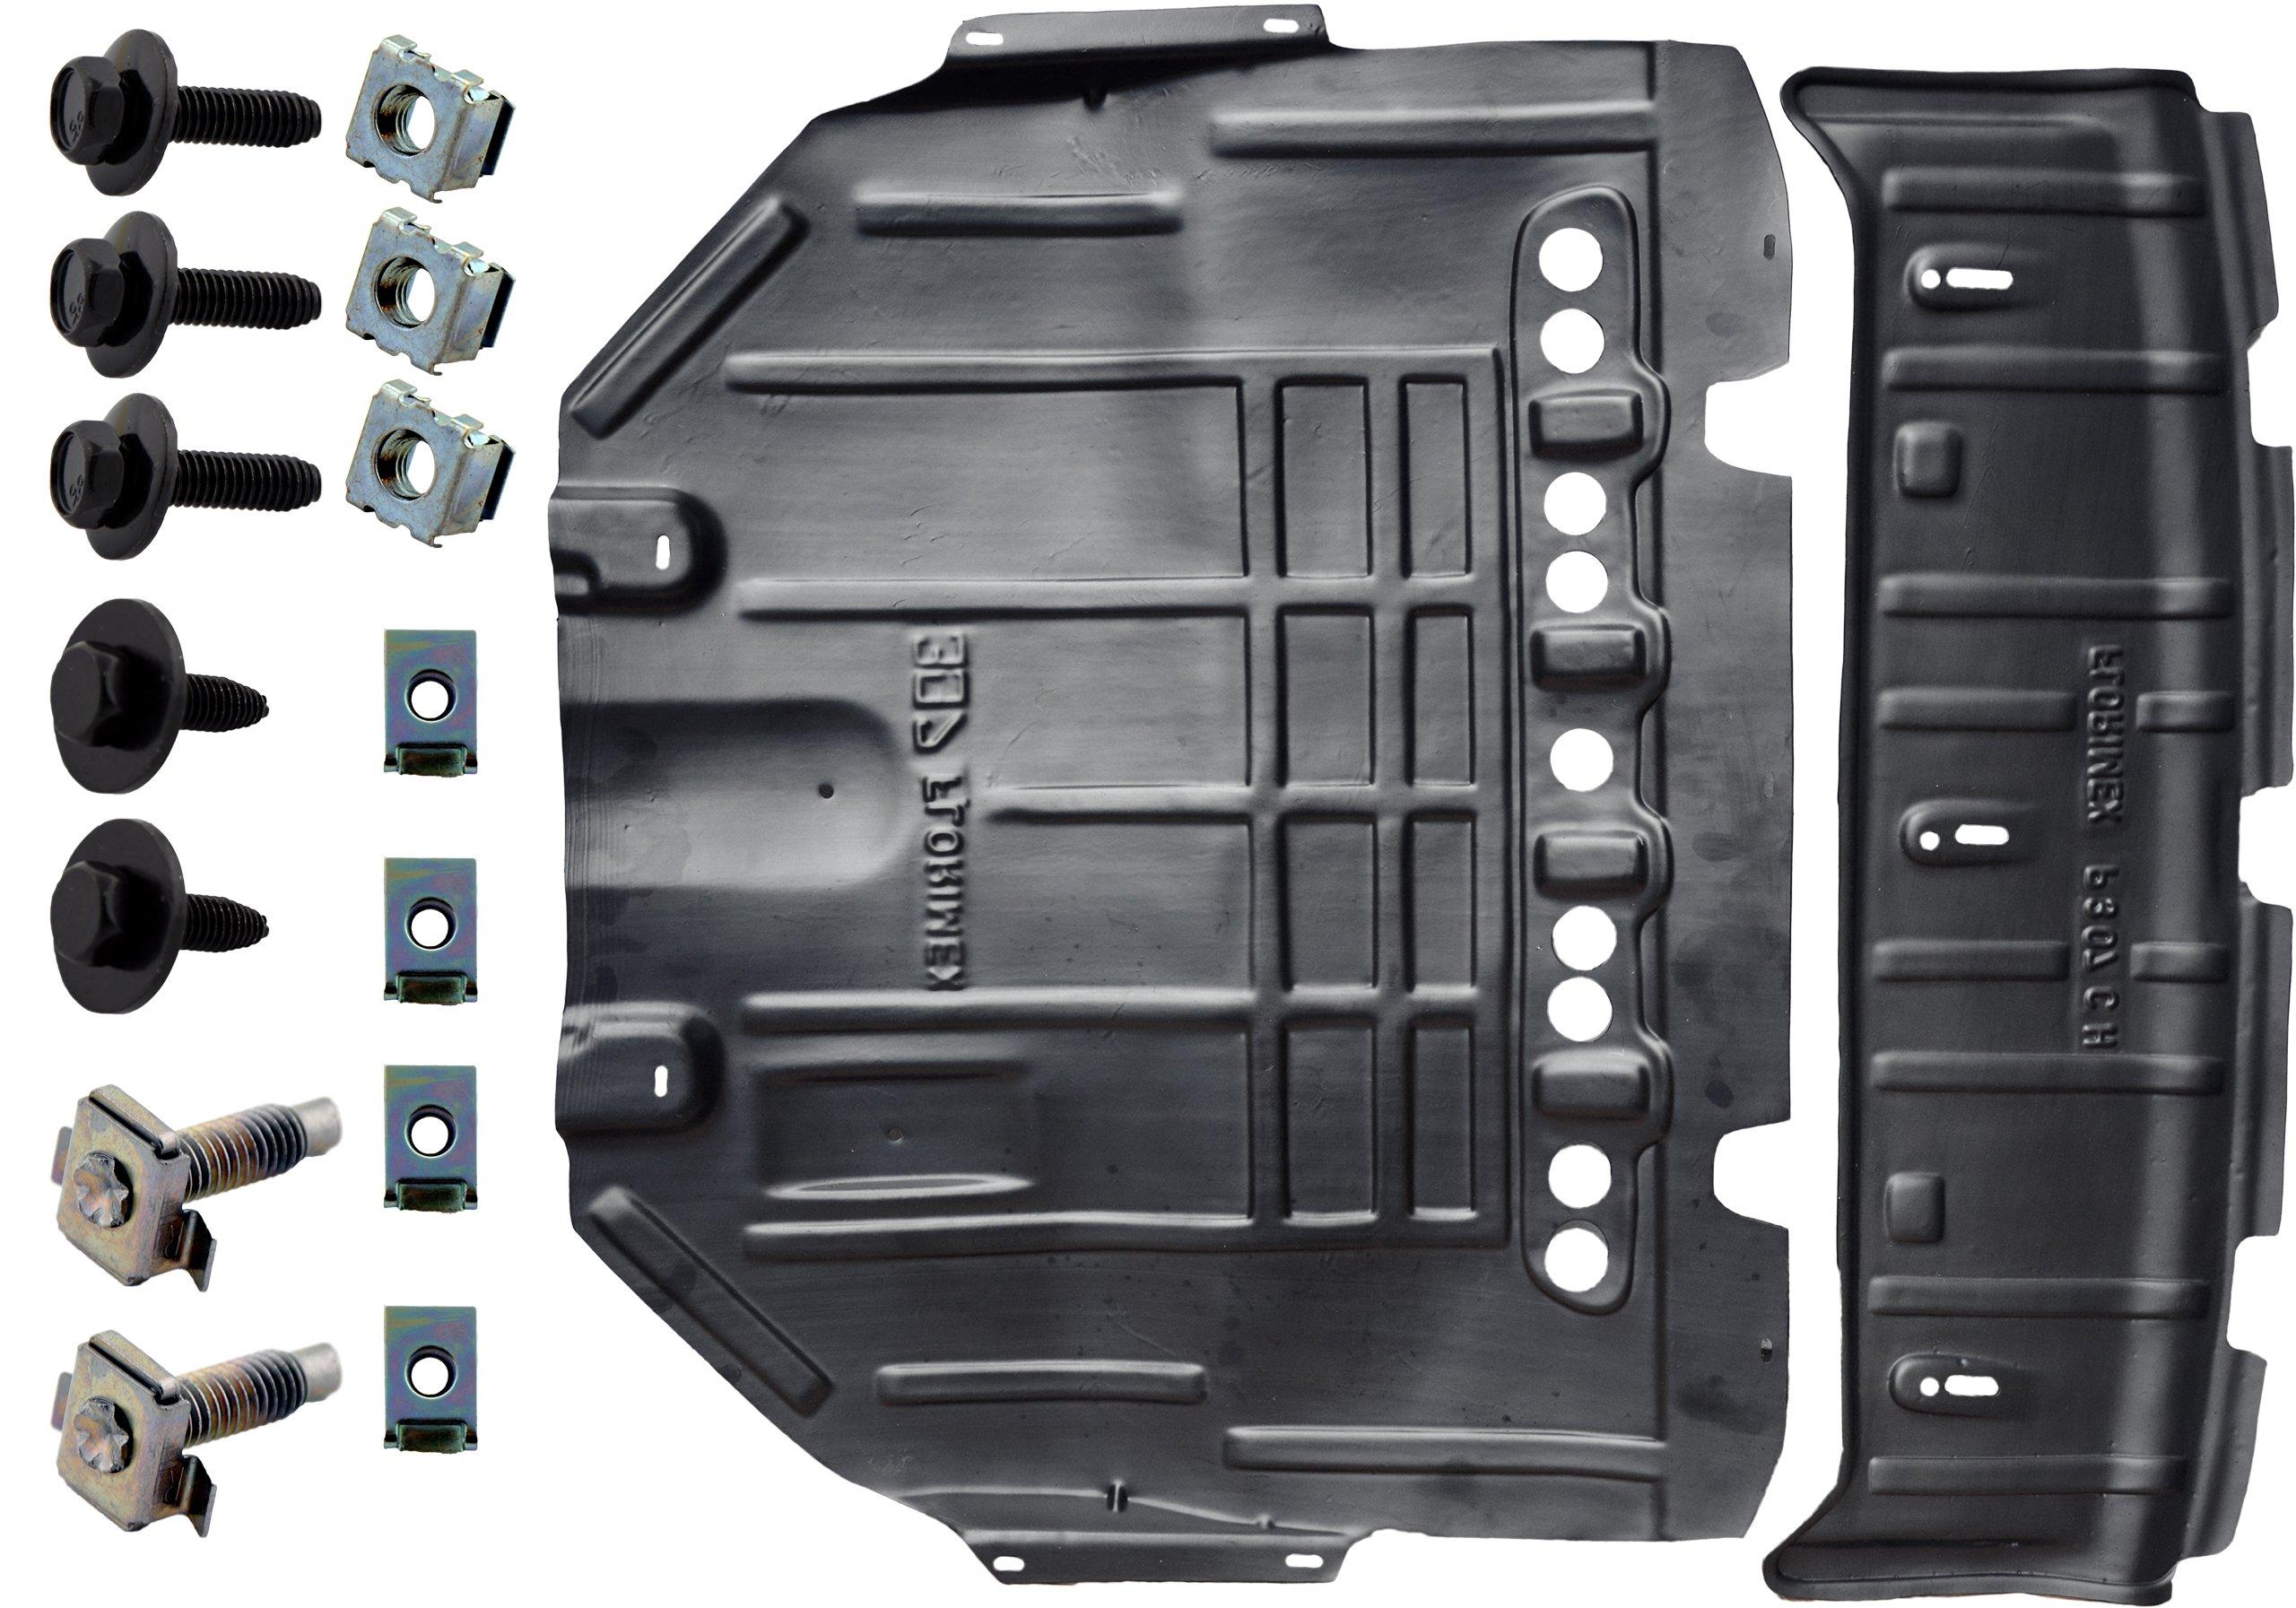 peugeot 307 2004-2011 крышка двигателя запонки hdpe